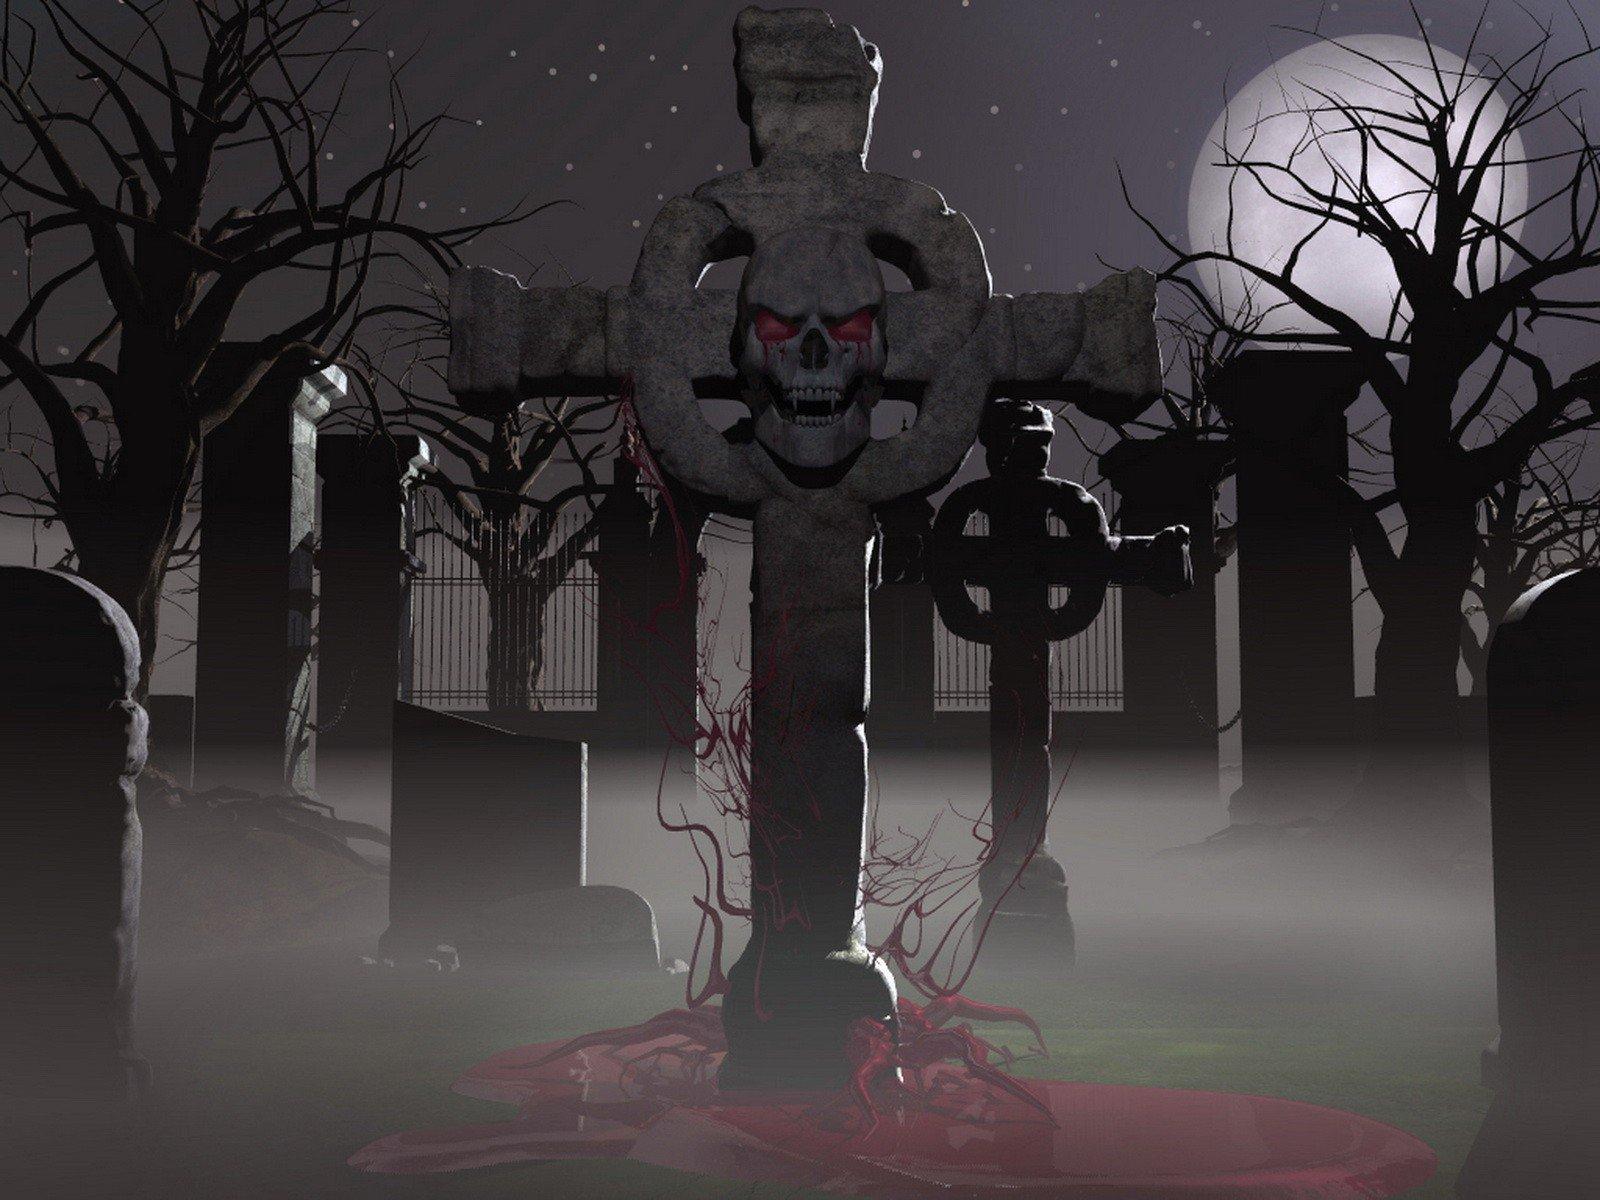 Dark art - Page 3 Evhruj5ns9g